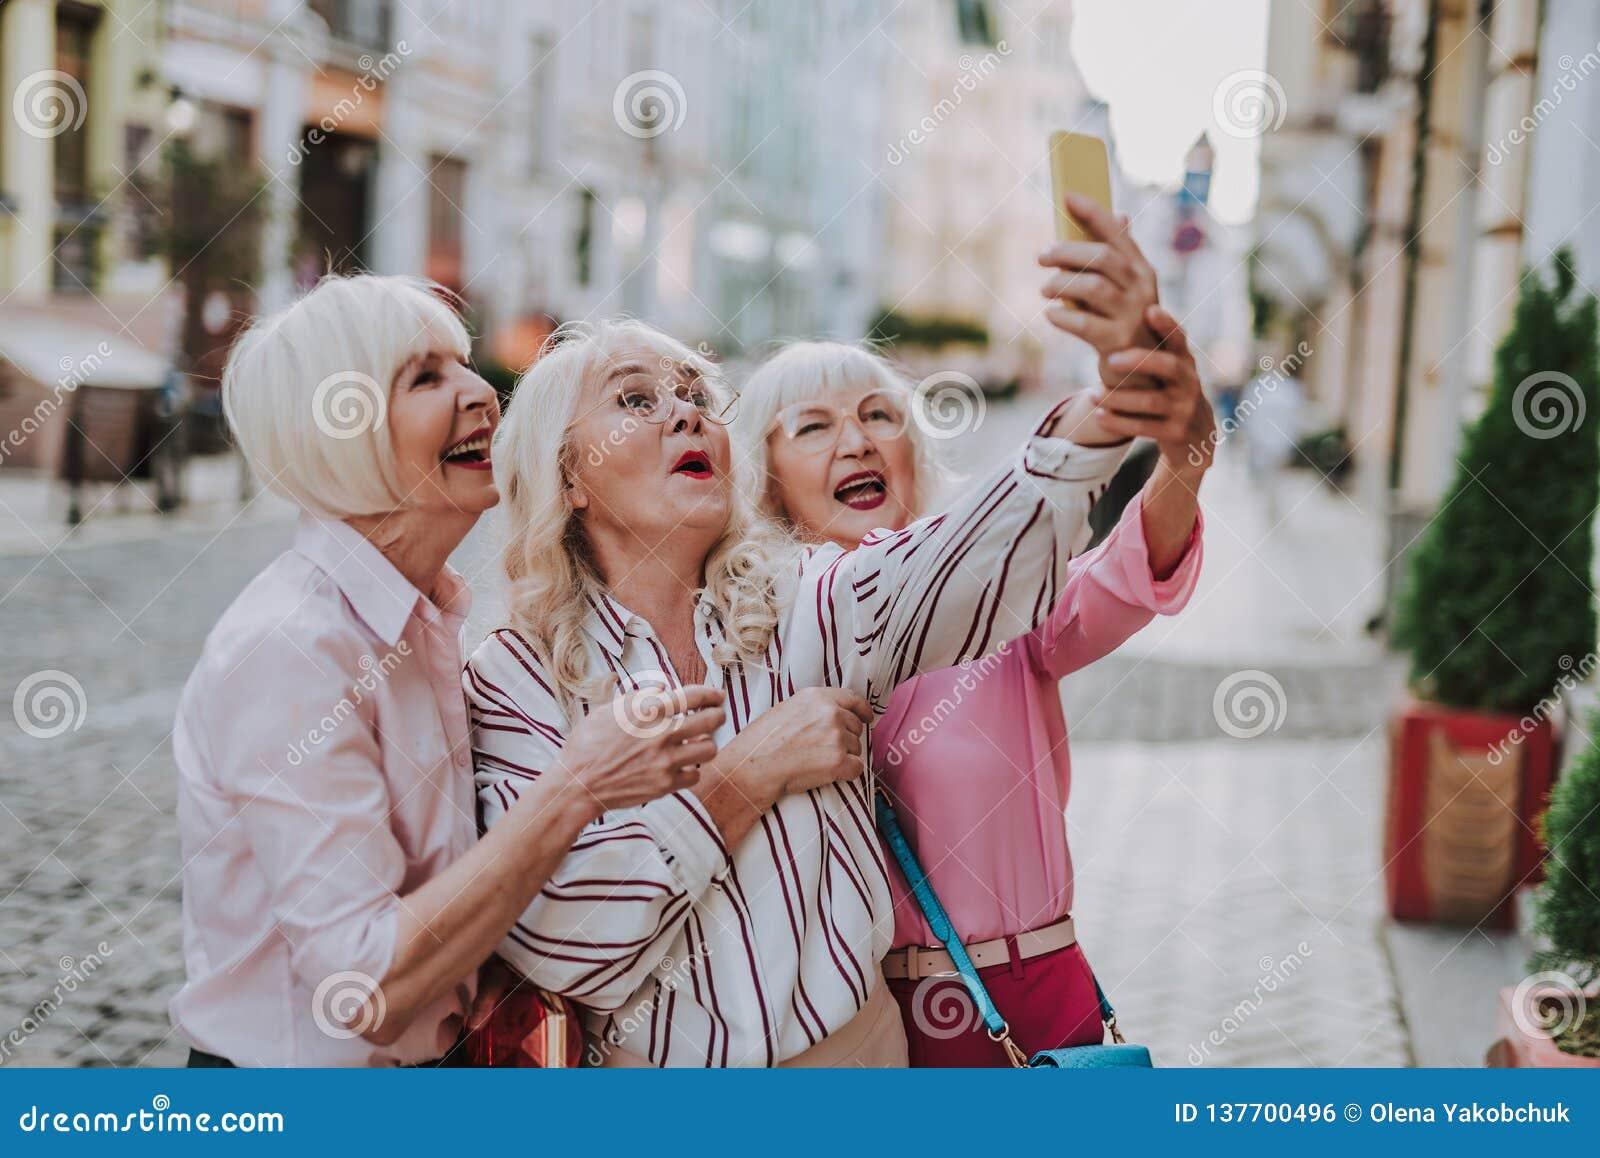 Three funny old ladies making selfie together